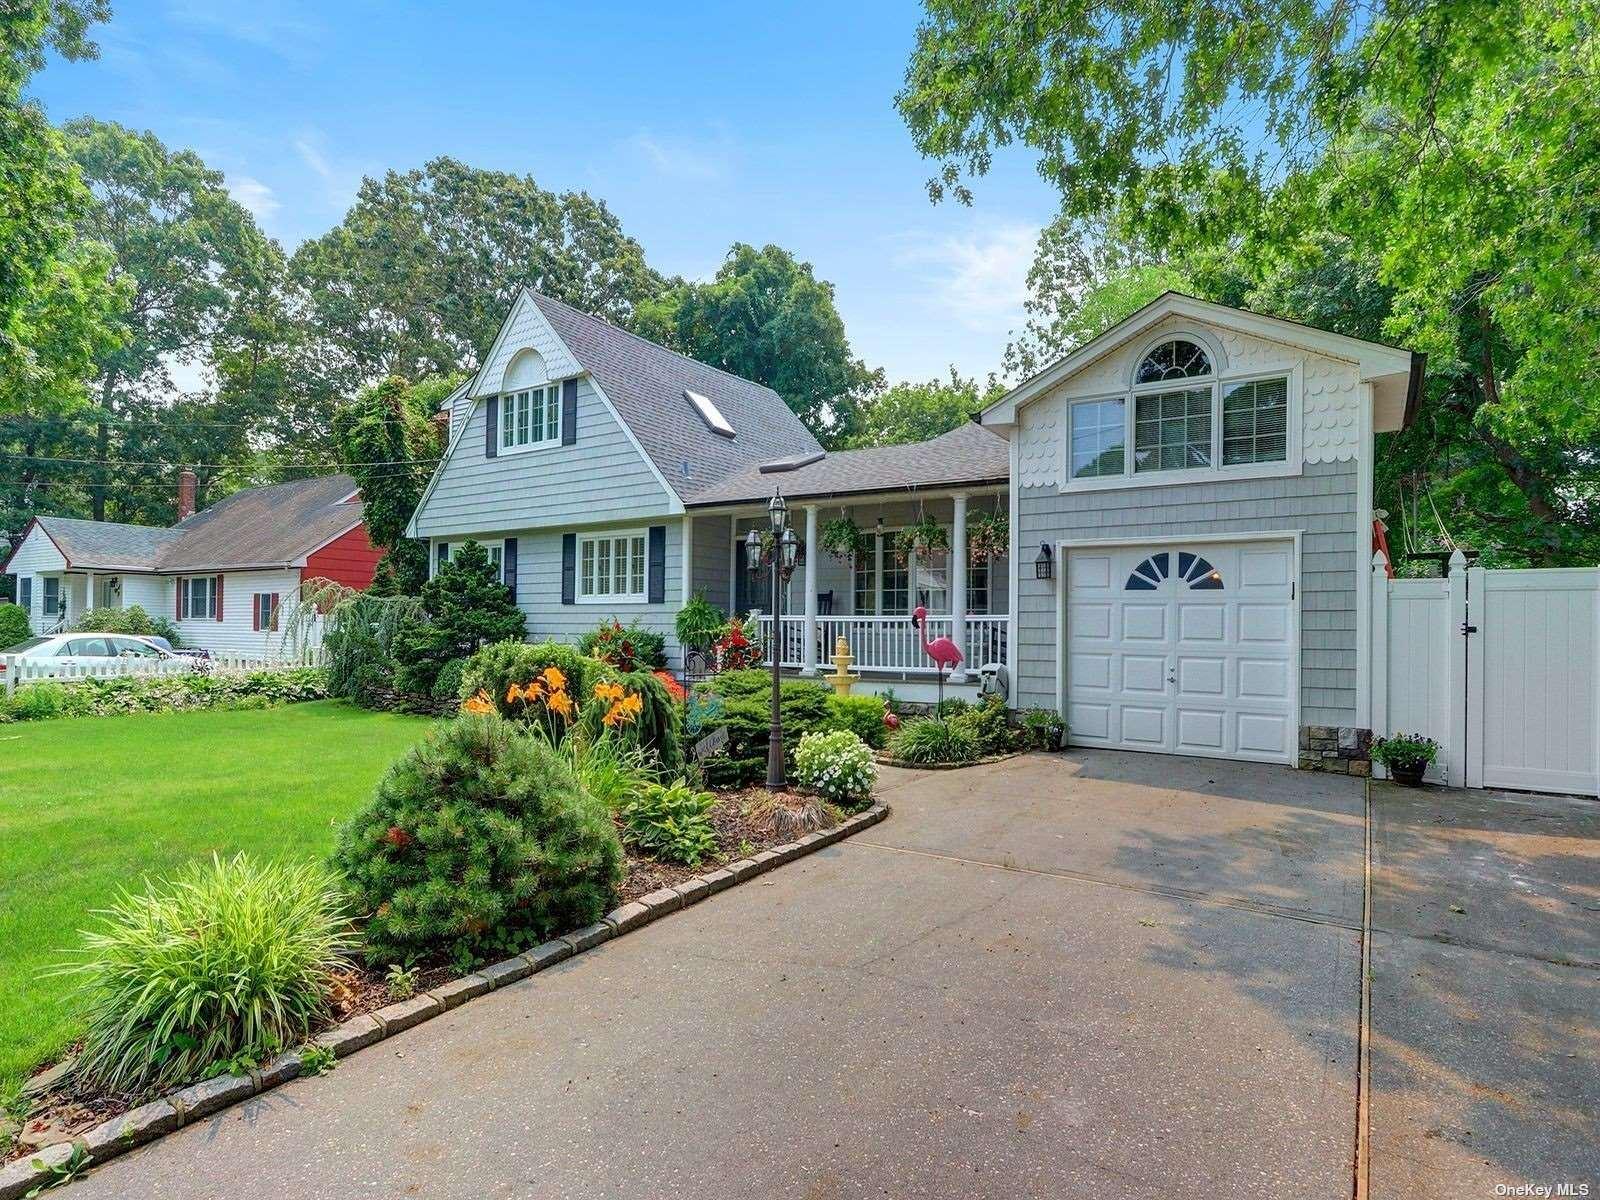 92 Moriches Avenue, Mastic, NY 11950 - MLS#: 3331088